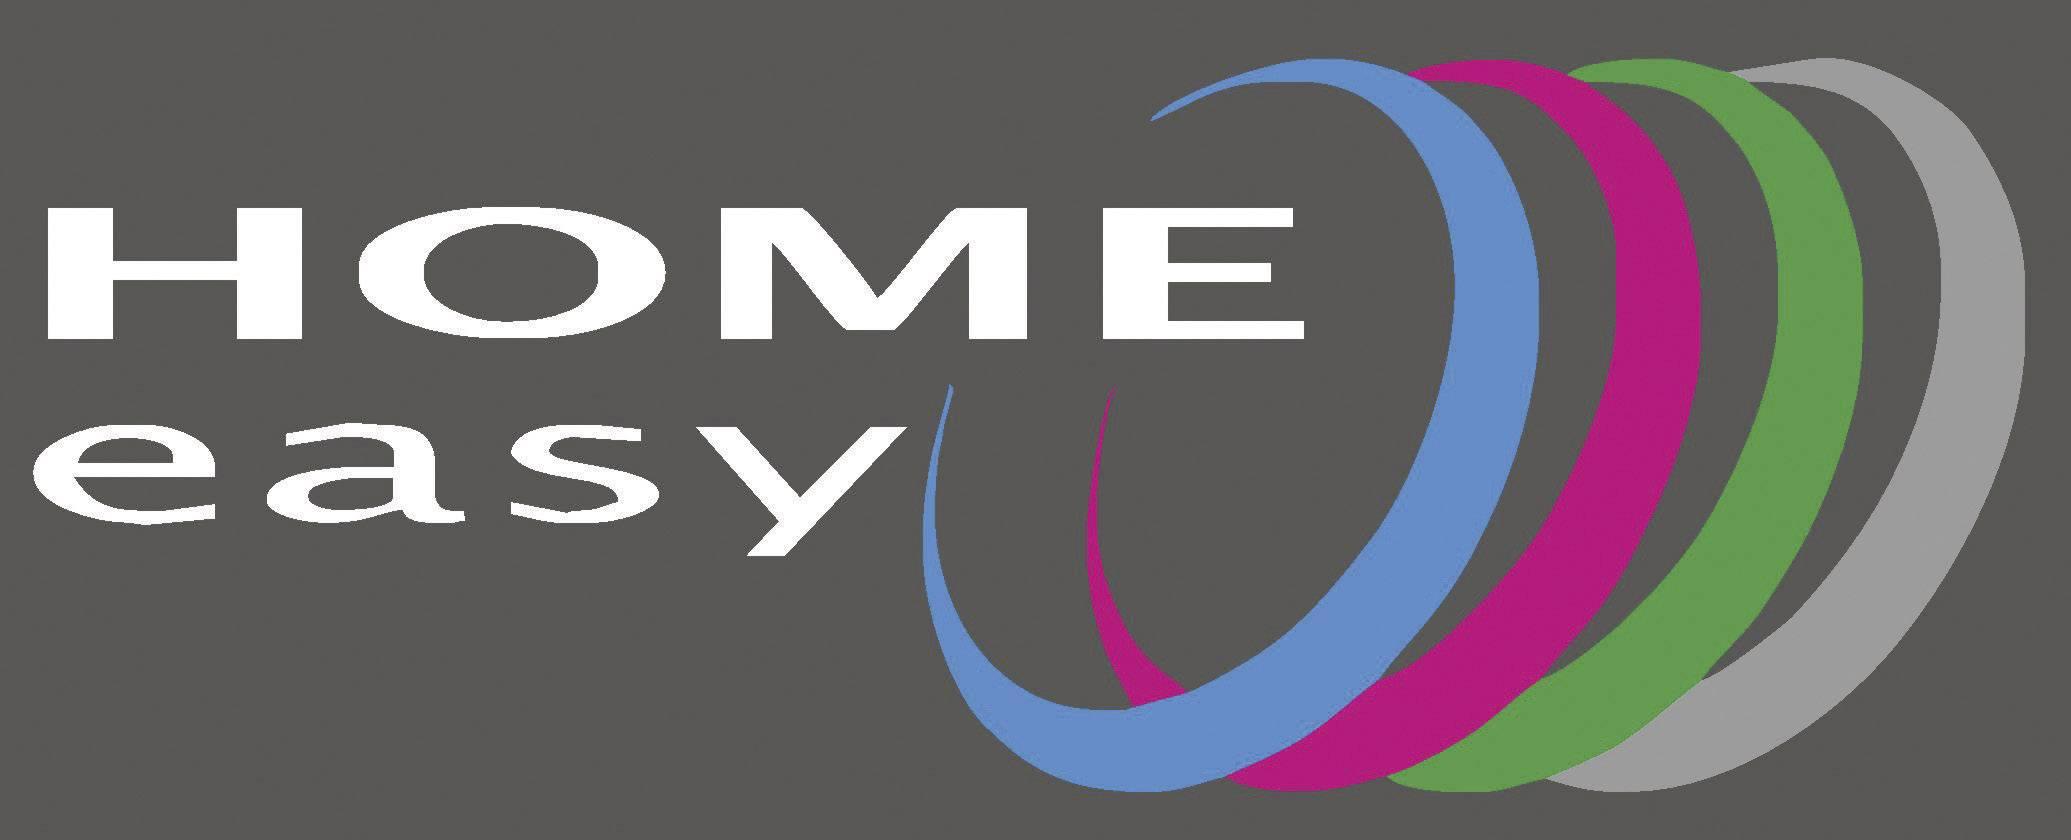 HOMEeasy